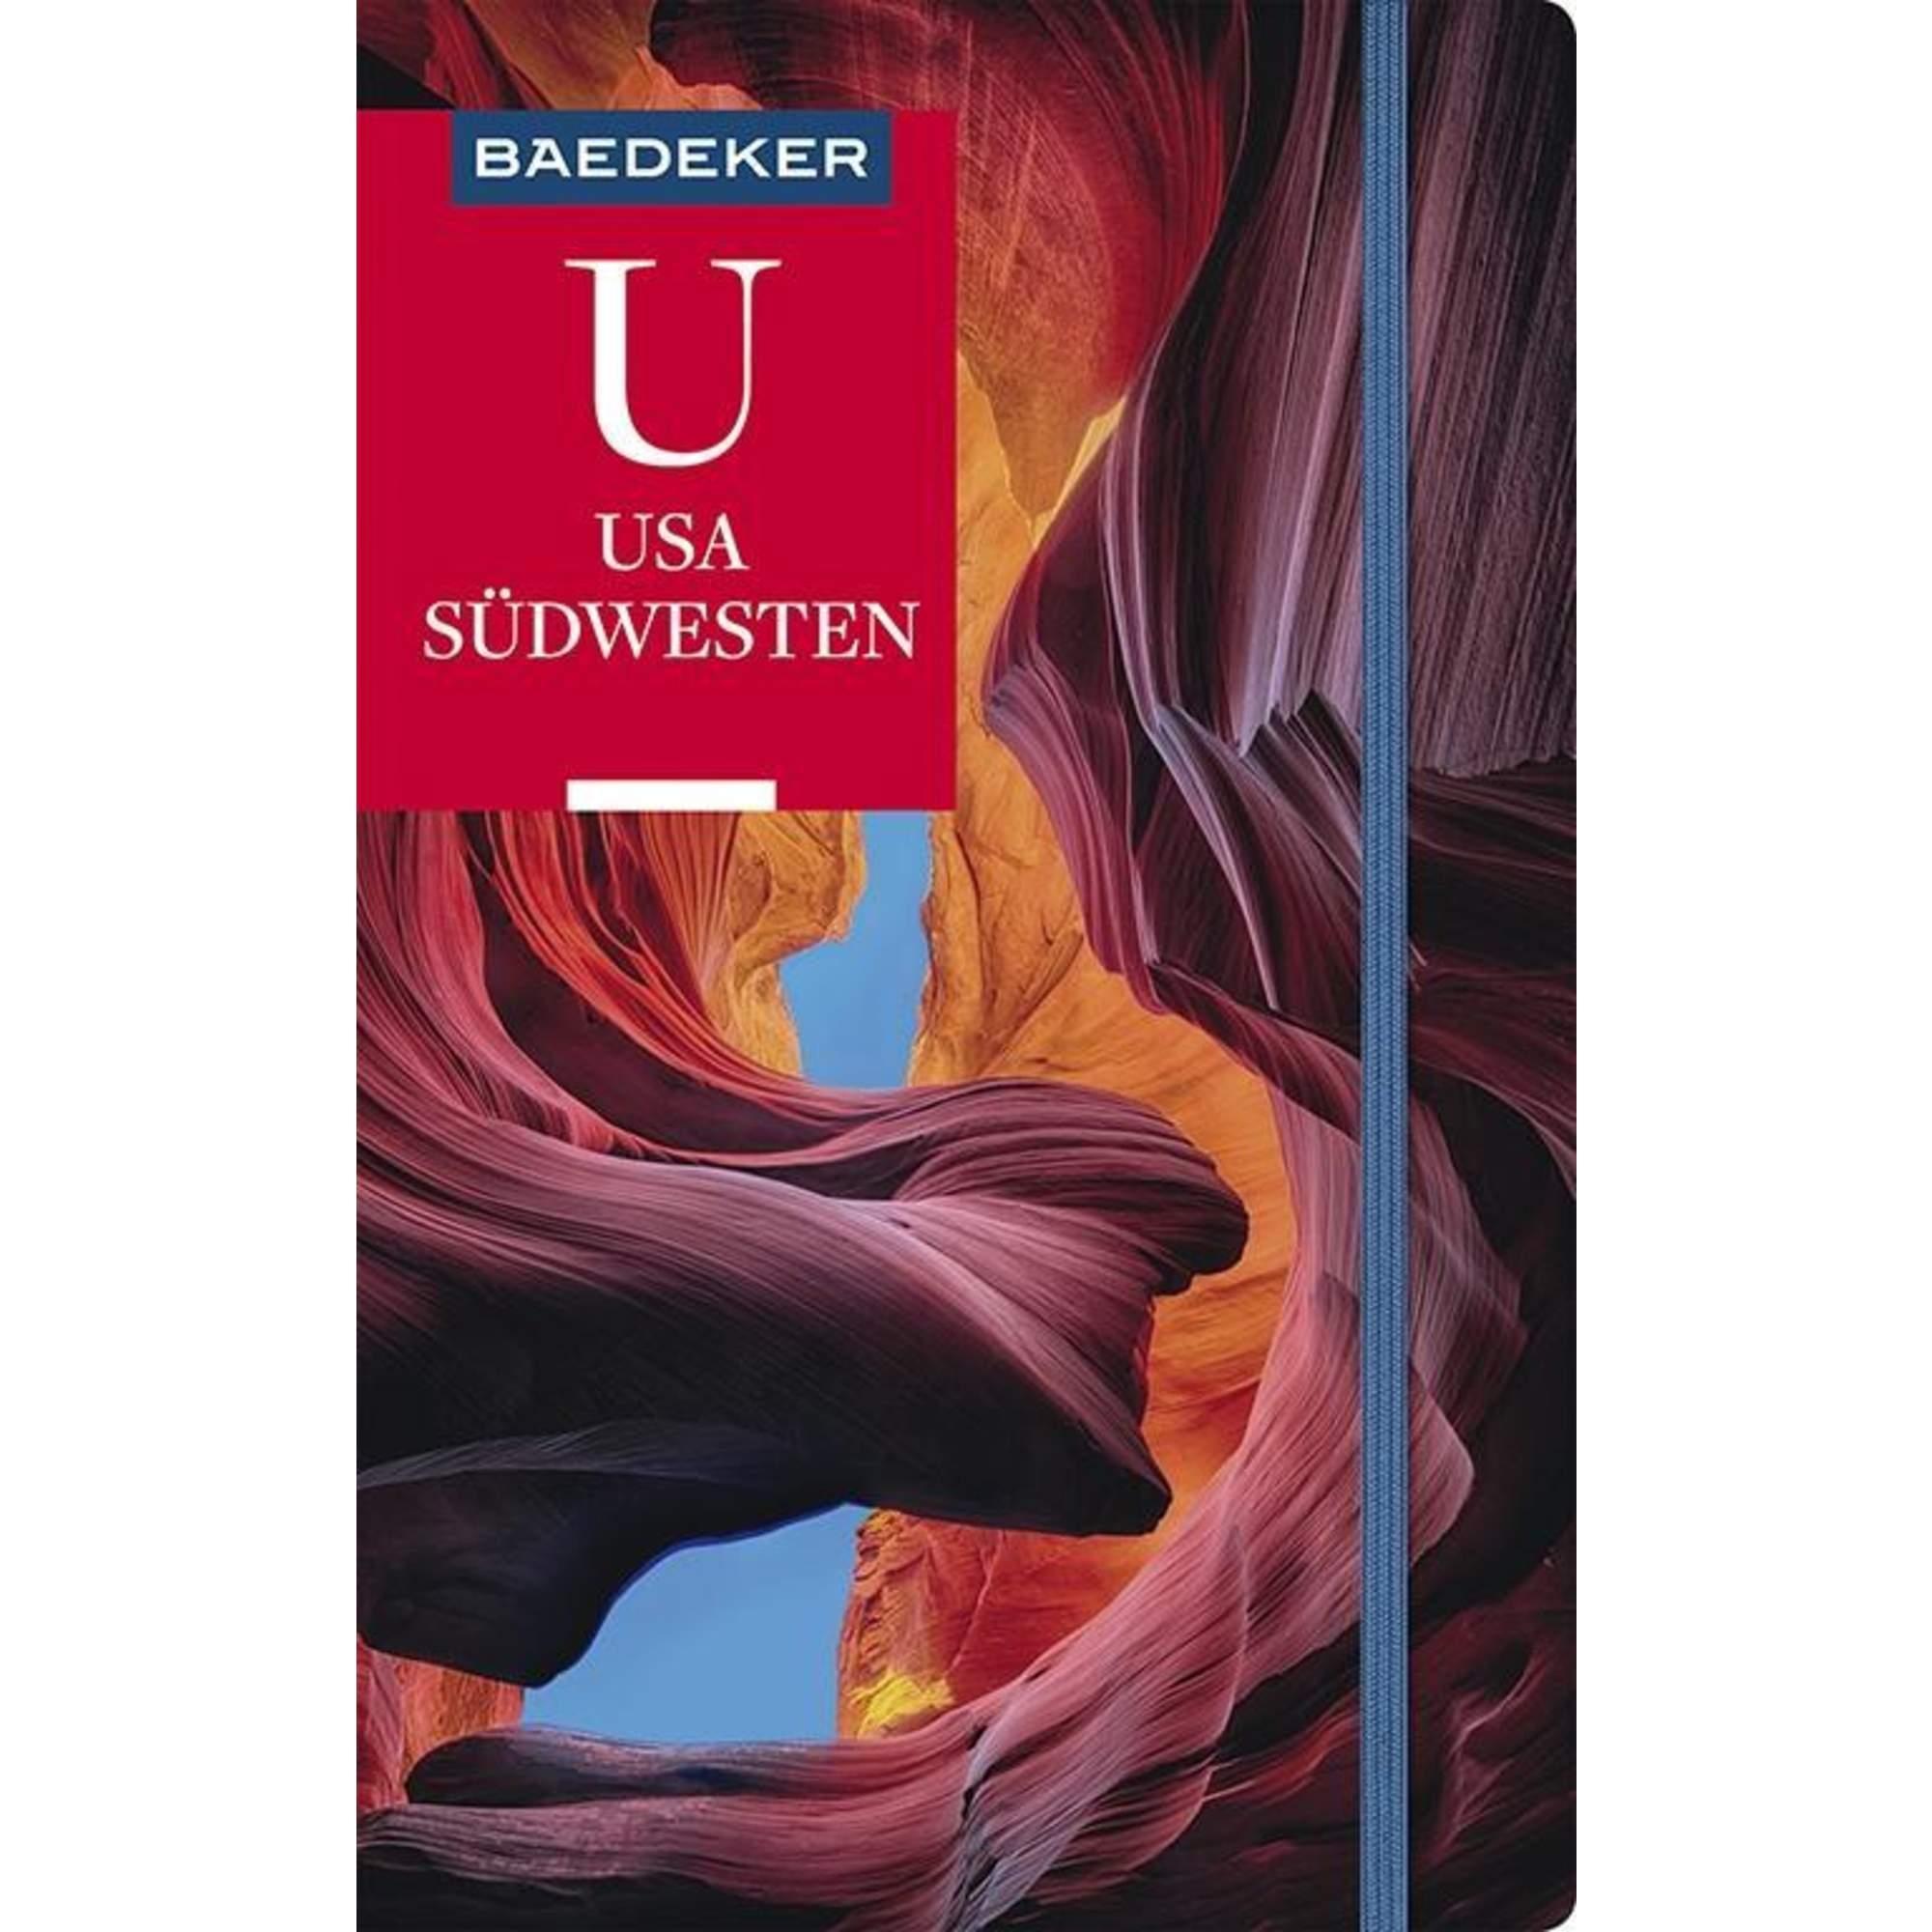 Baedeker Reiseführer USA Südwesten, 28,00 Euro